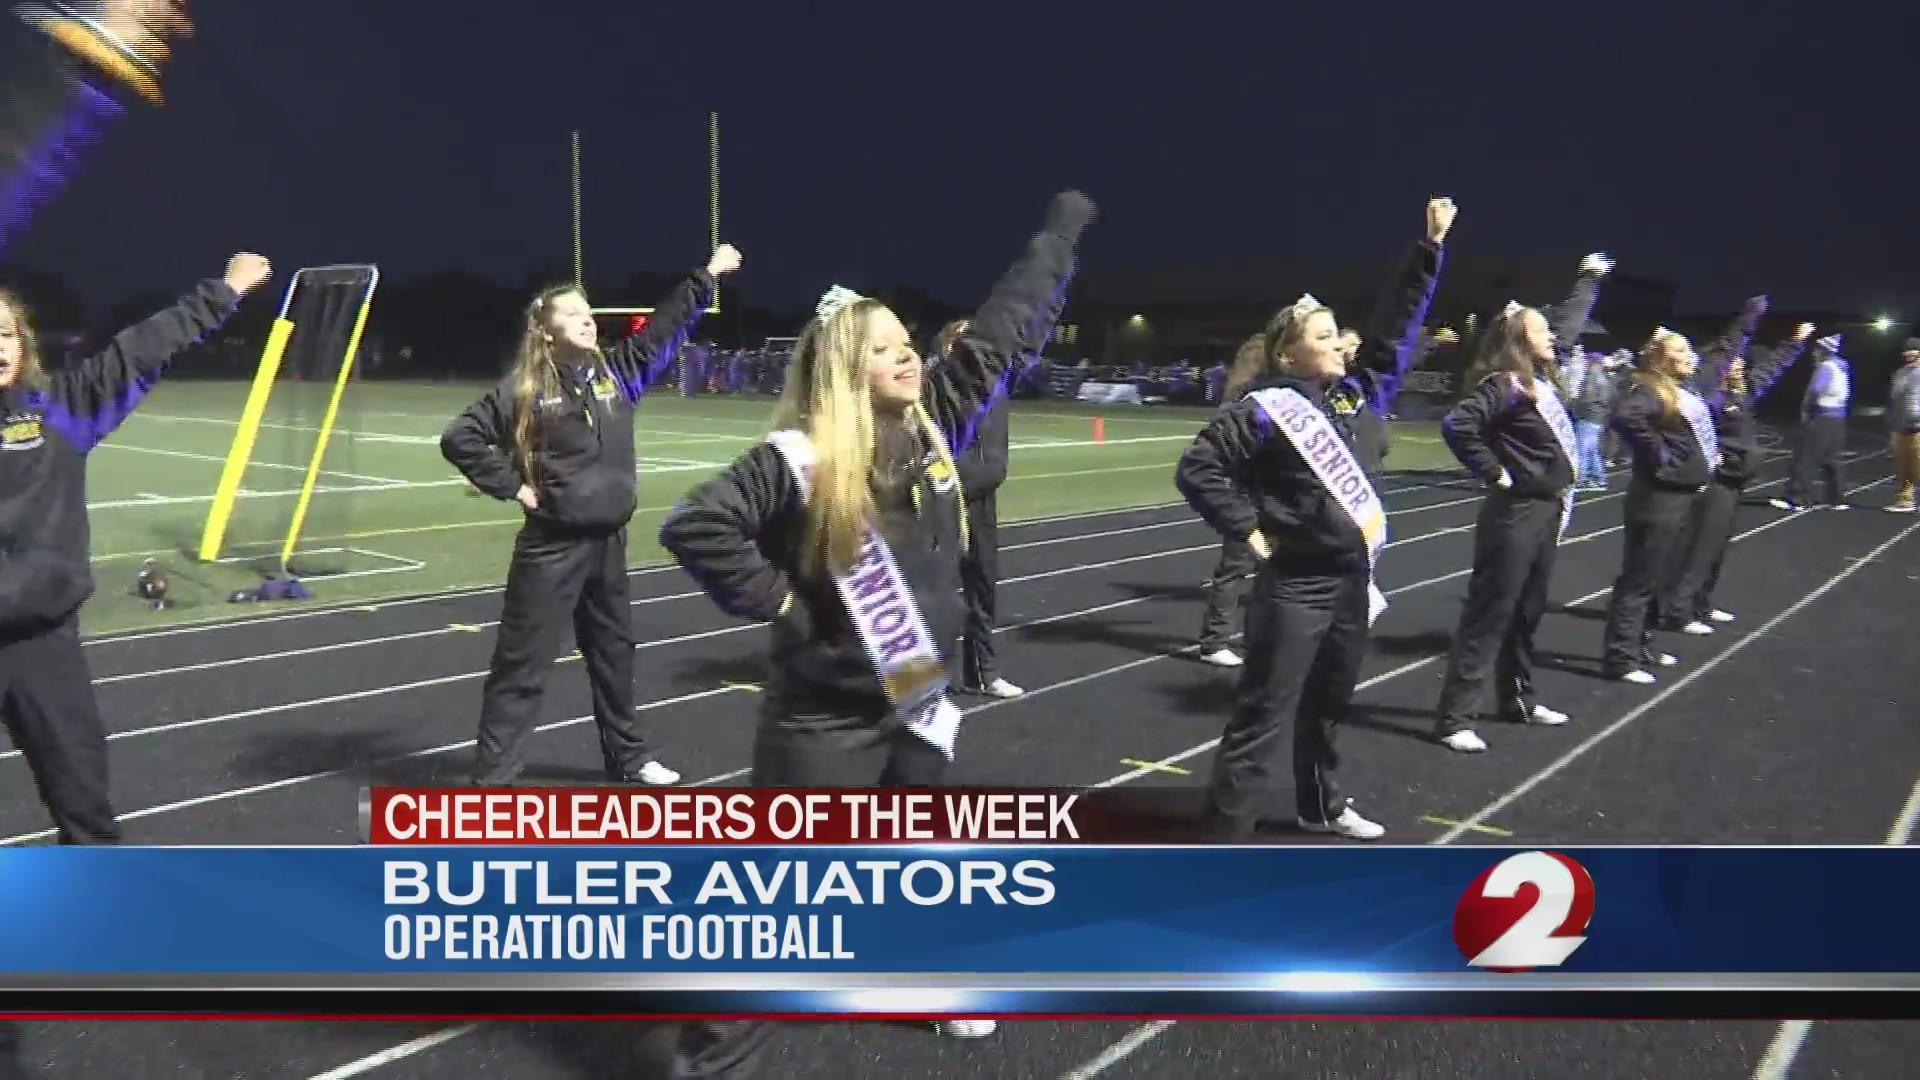 Operation Football Cheerleaders of the Week 8: Butler Aviators